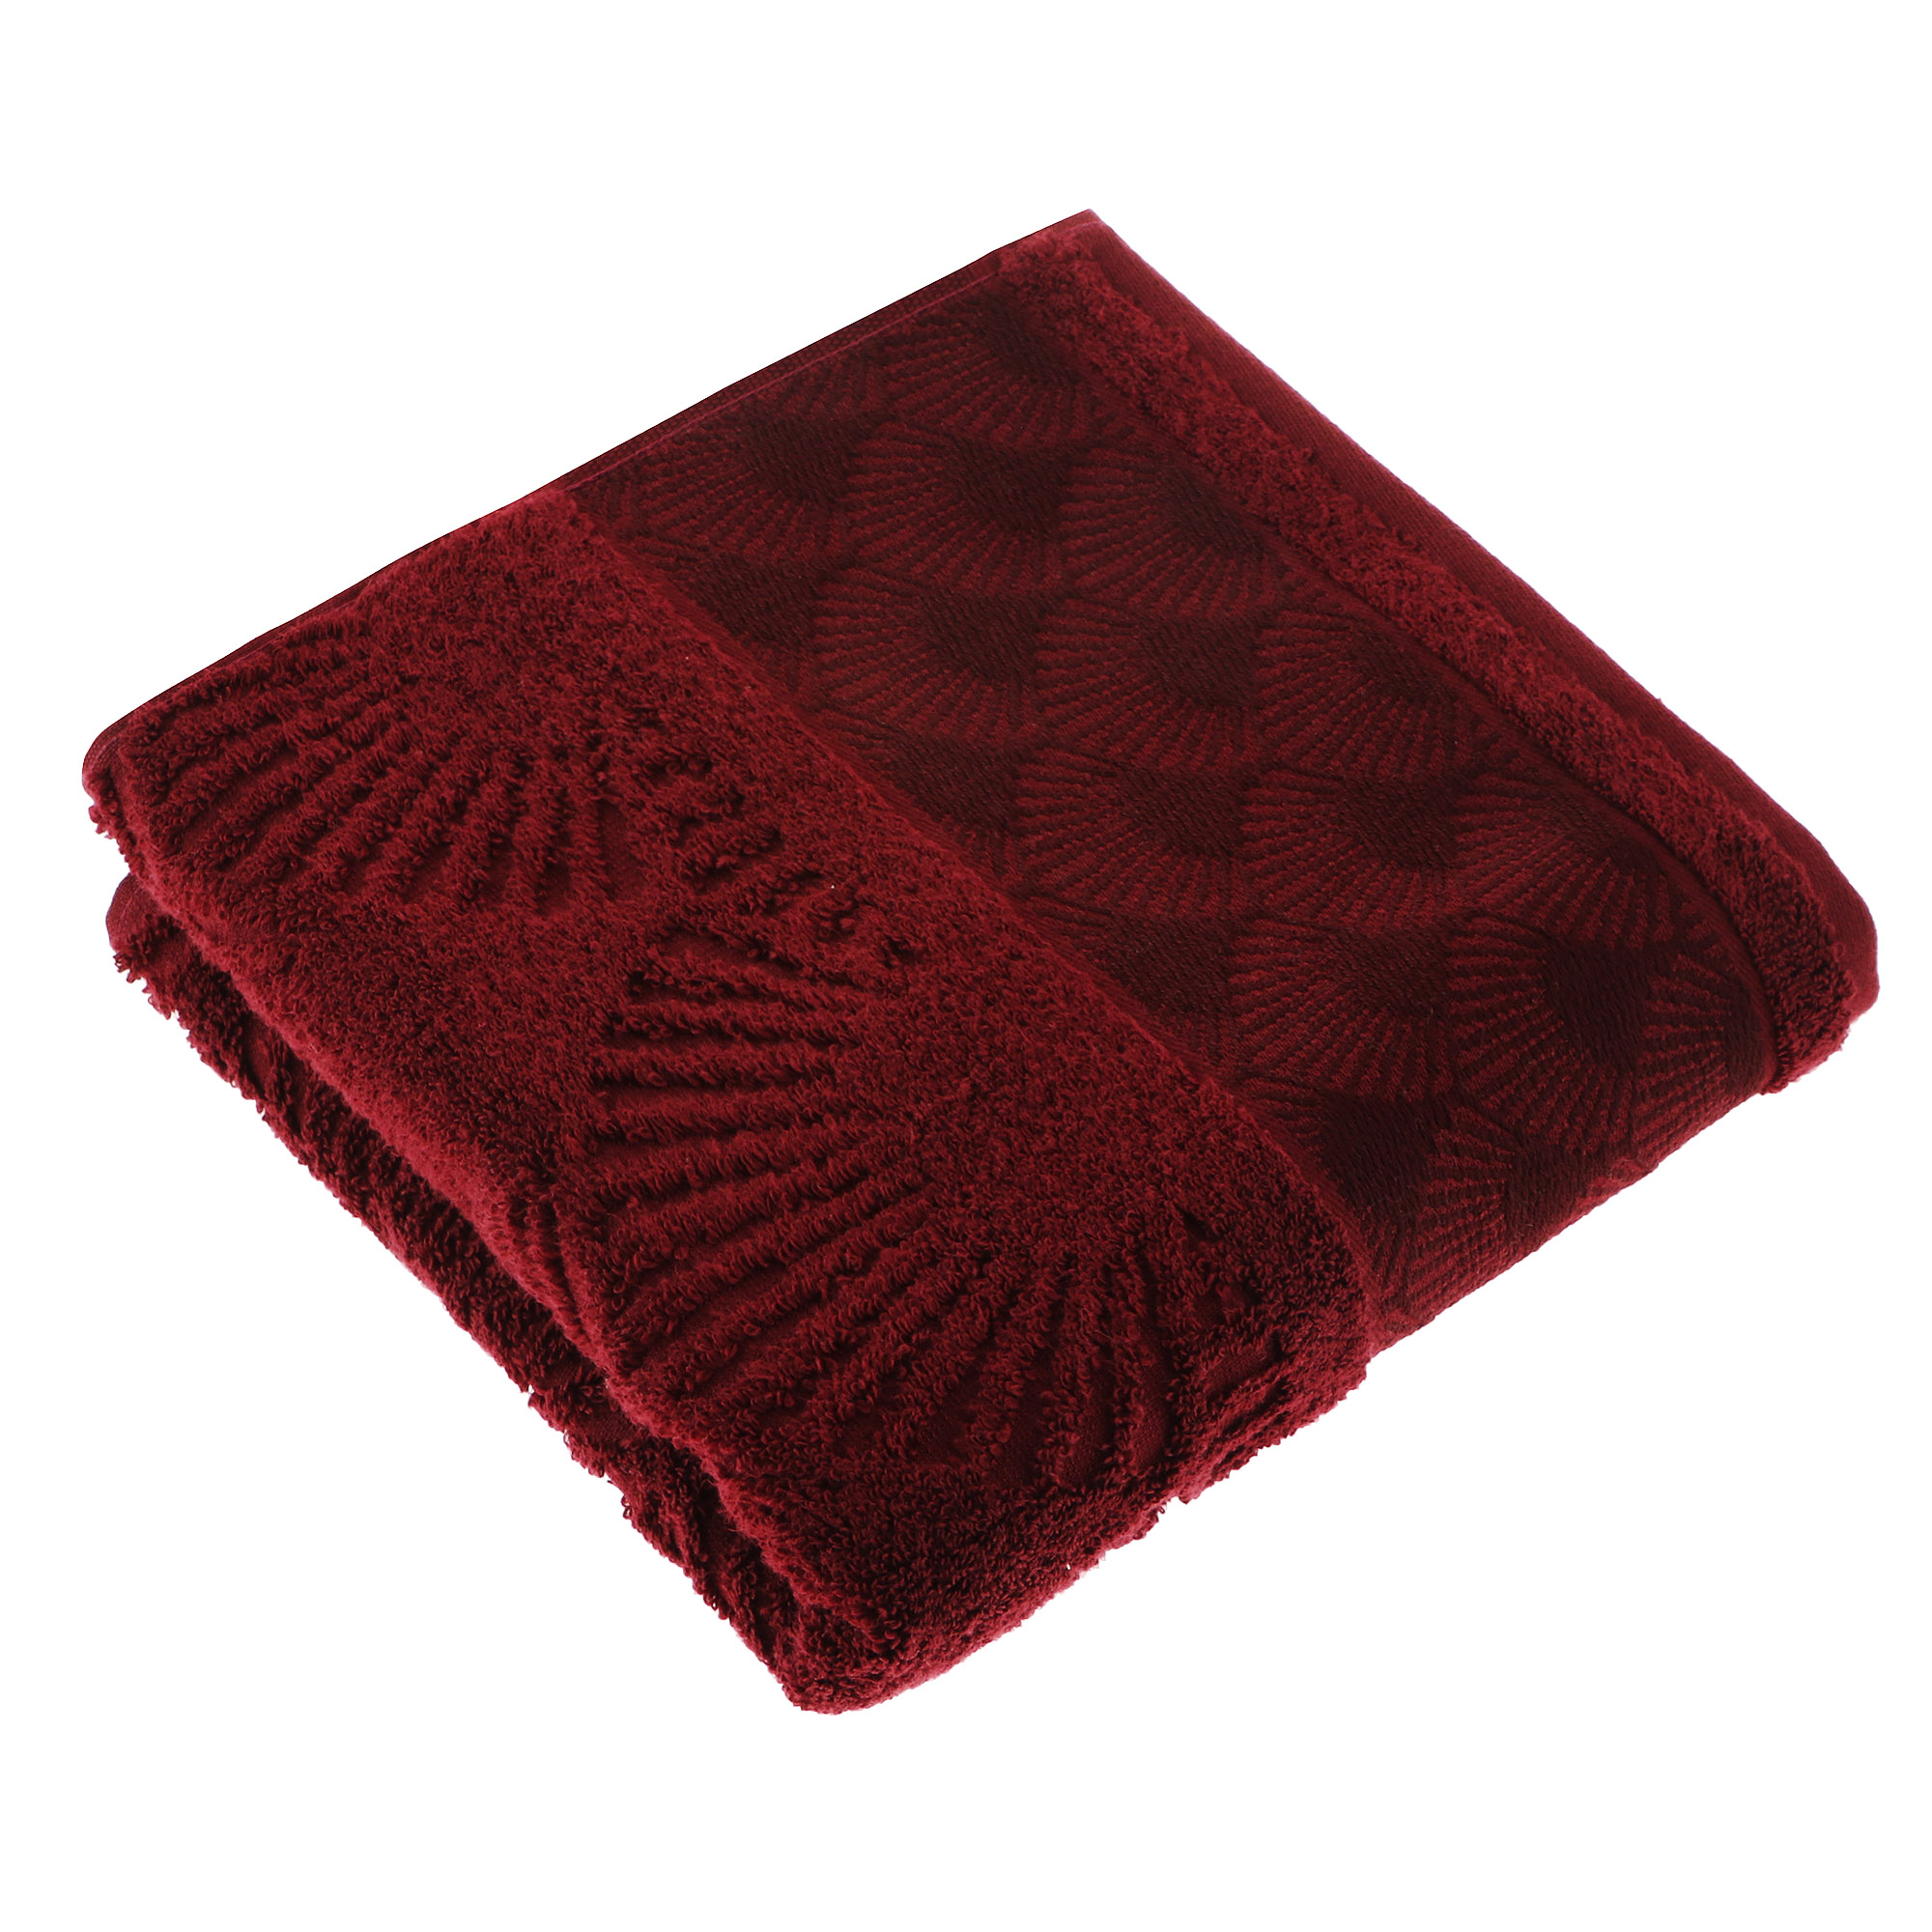 Полотенце махровое Cleanelly пакконто 100х150 см фото